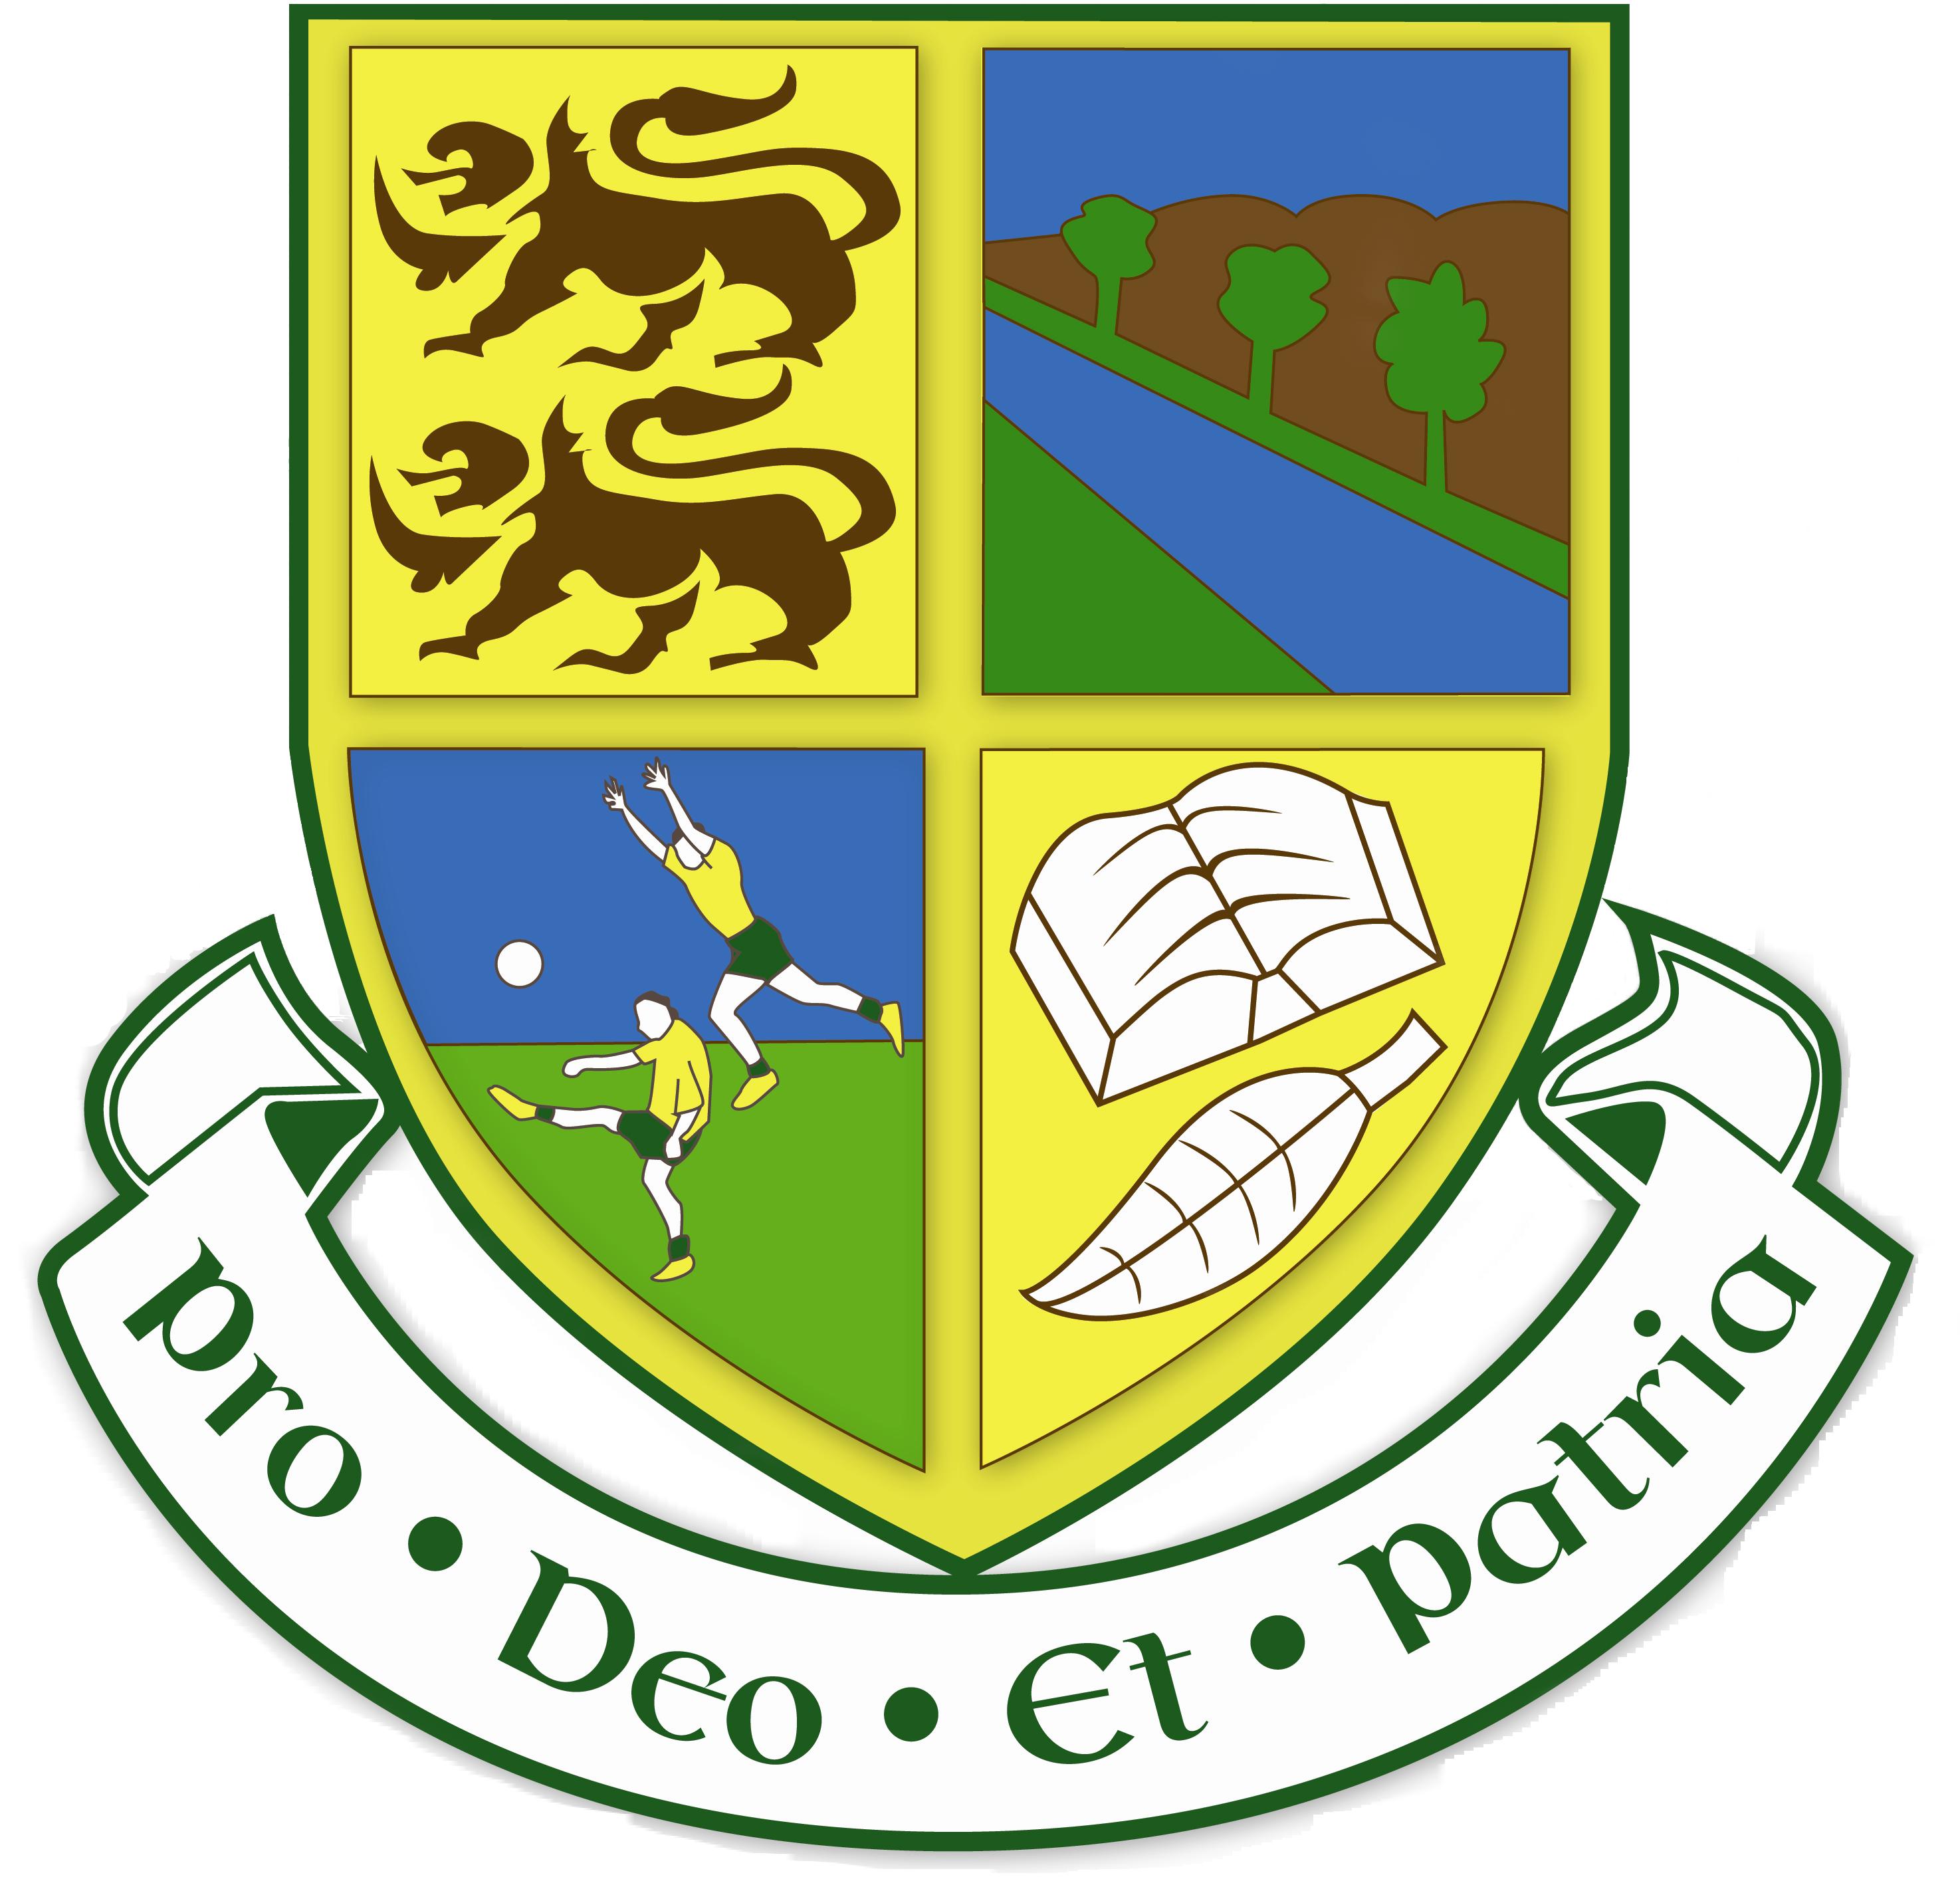 St Clare's Comprehensive School